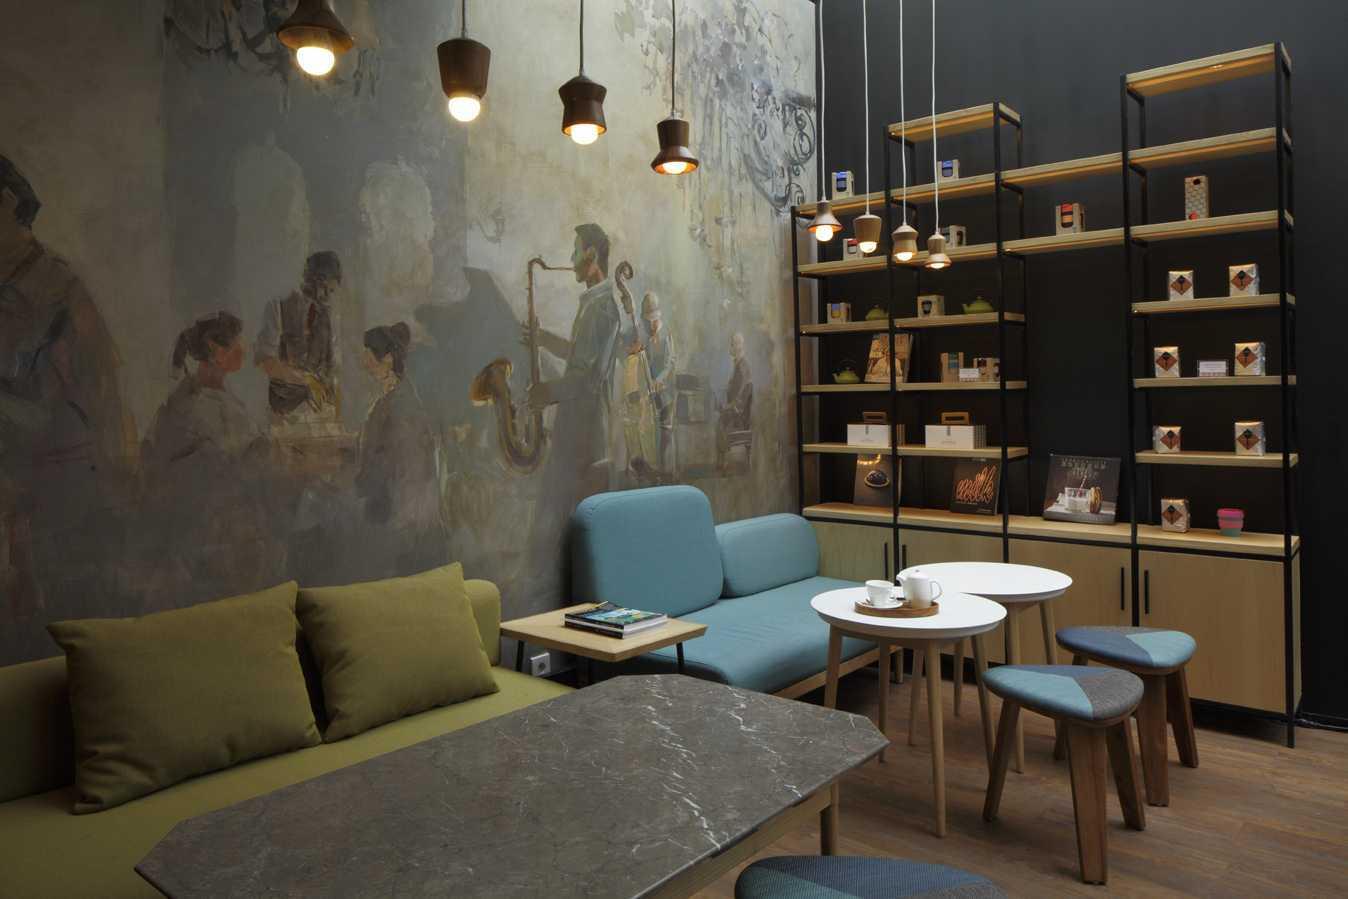 Foto inspirasi ide desain restoran industrial Seating area interior view oleh Alvin Tjitrowirjo, AlvinT Studio di Arsitag